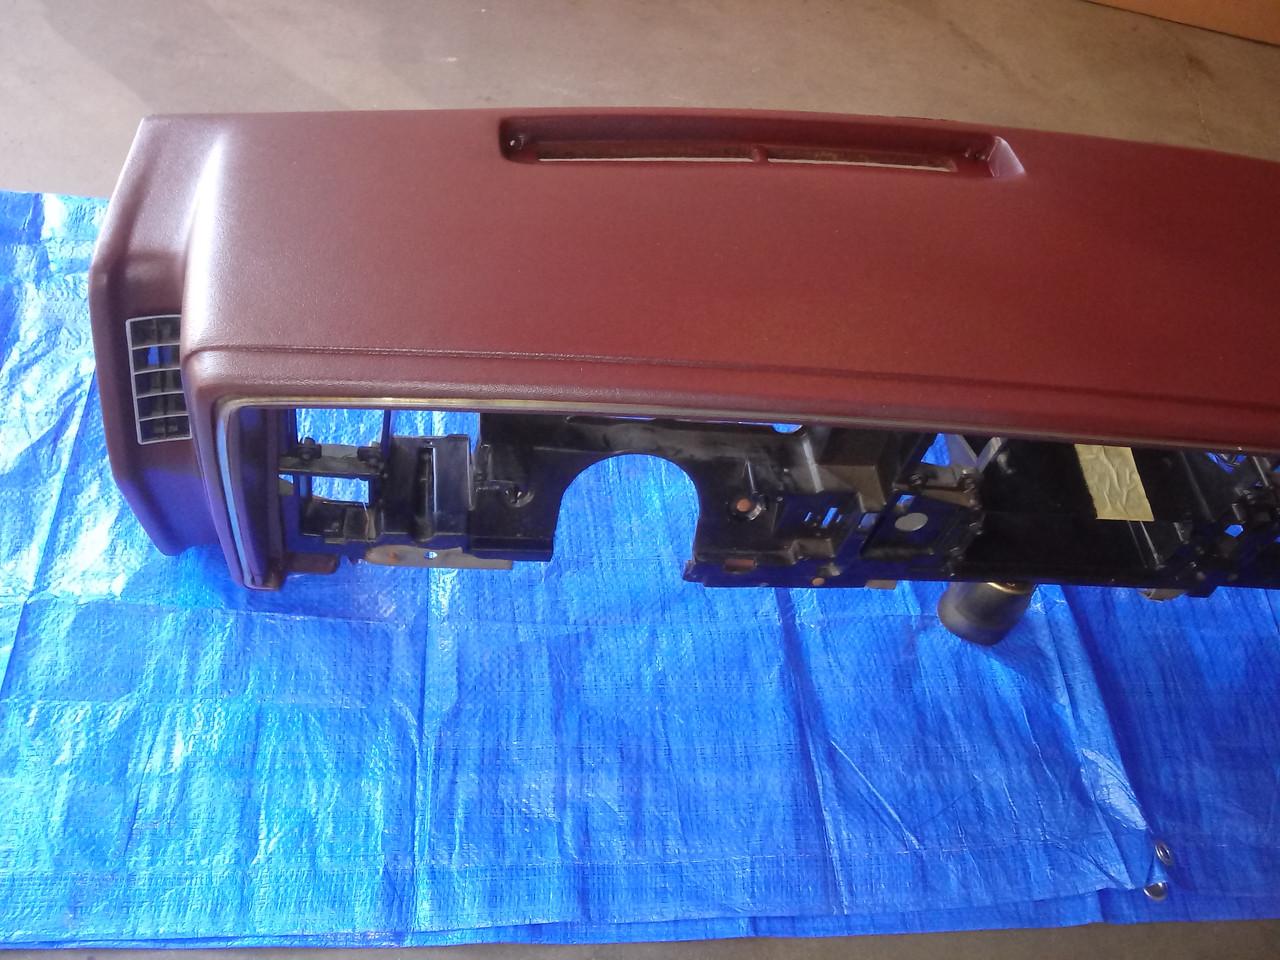 Original GM 1979-1980-1981-1982-1984-1985 Buick Riviera Dash/Dashboard-Burgundy